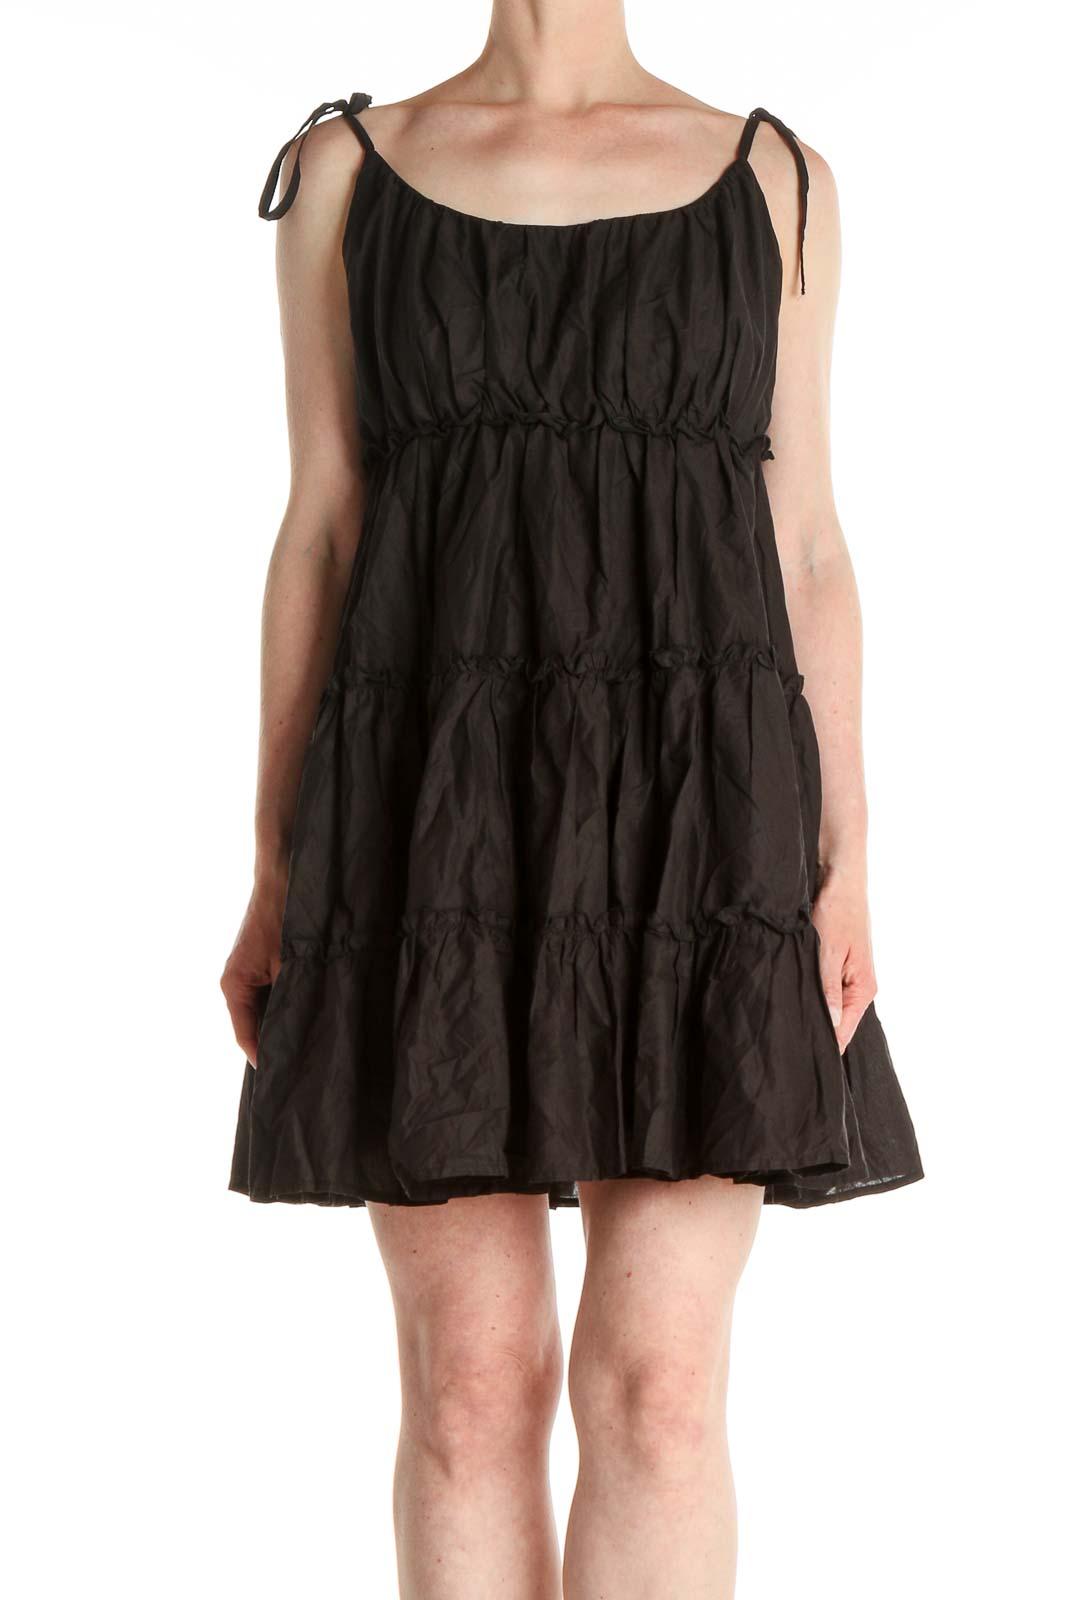 Black Solid Punk Fit & Flare Dress Front